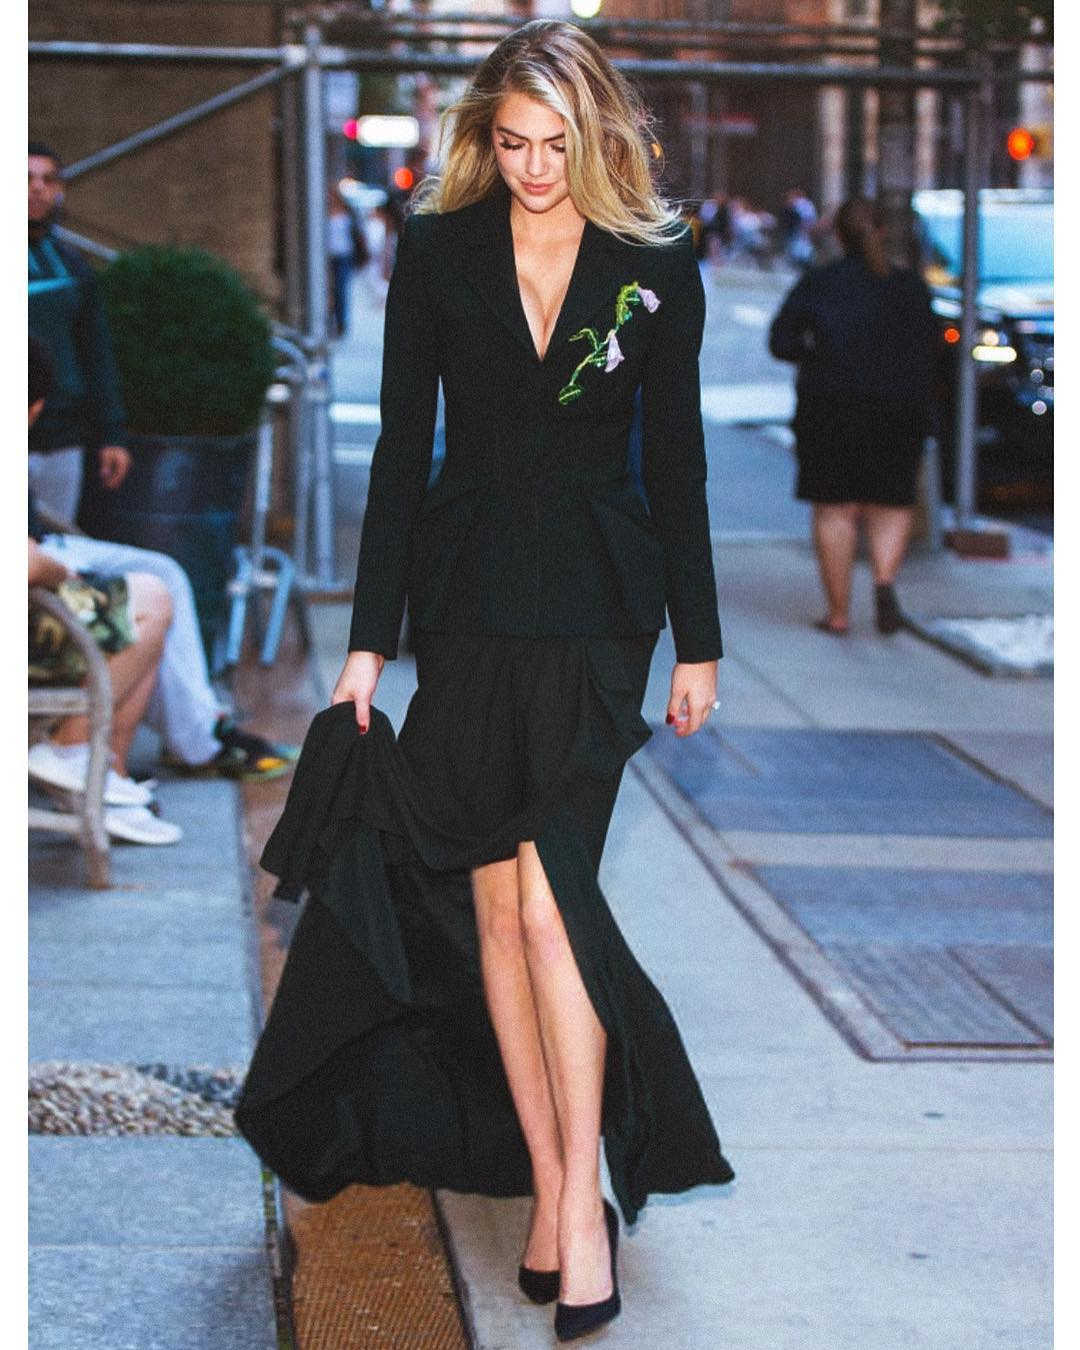 Модель Кейт Аптон вышла замуж— Тайная церемония